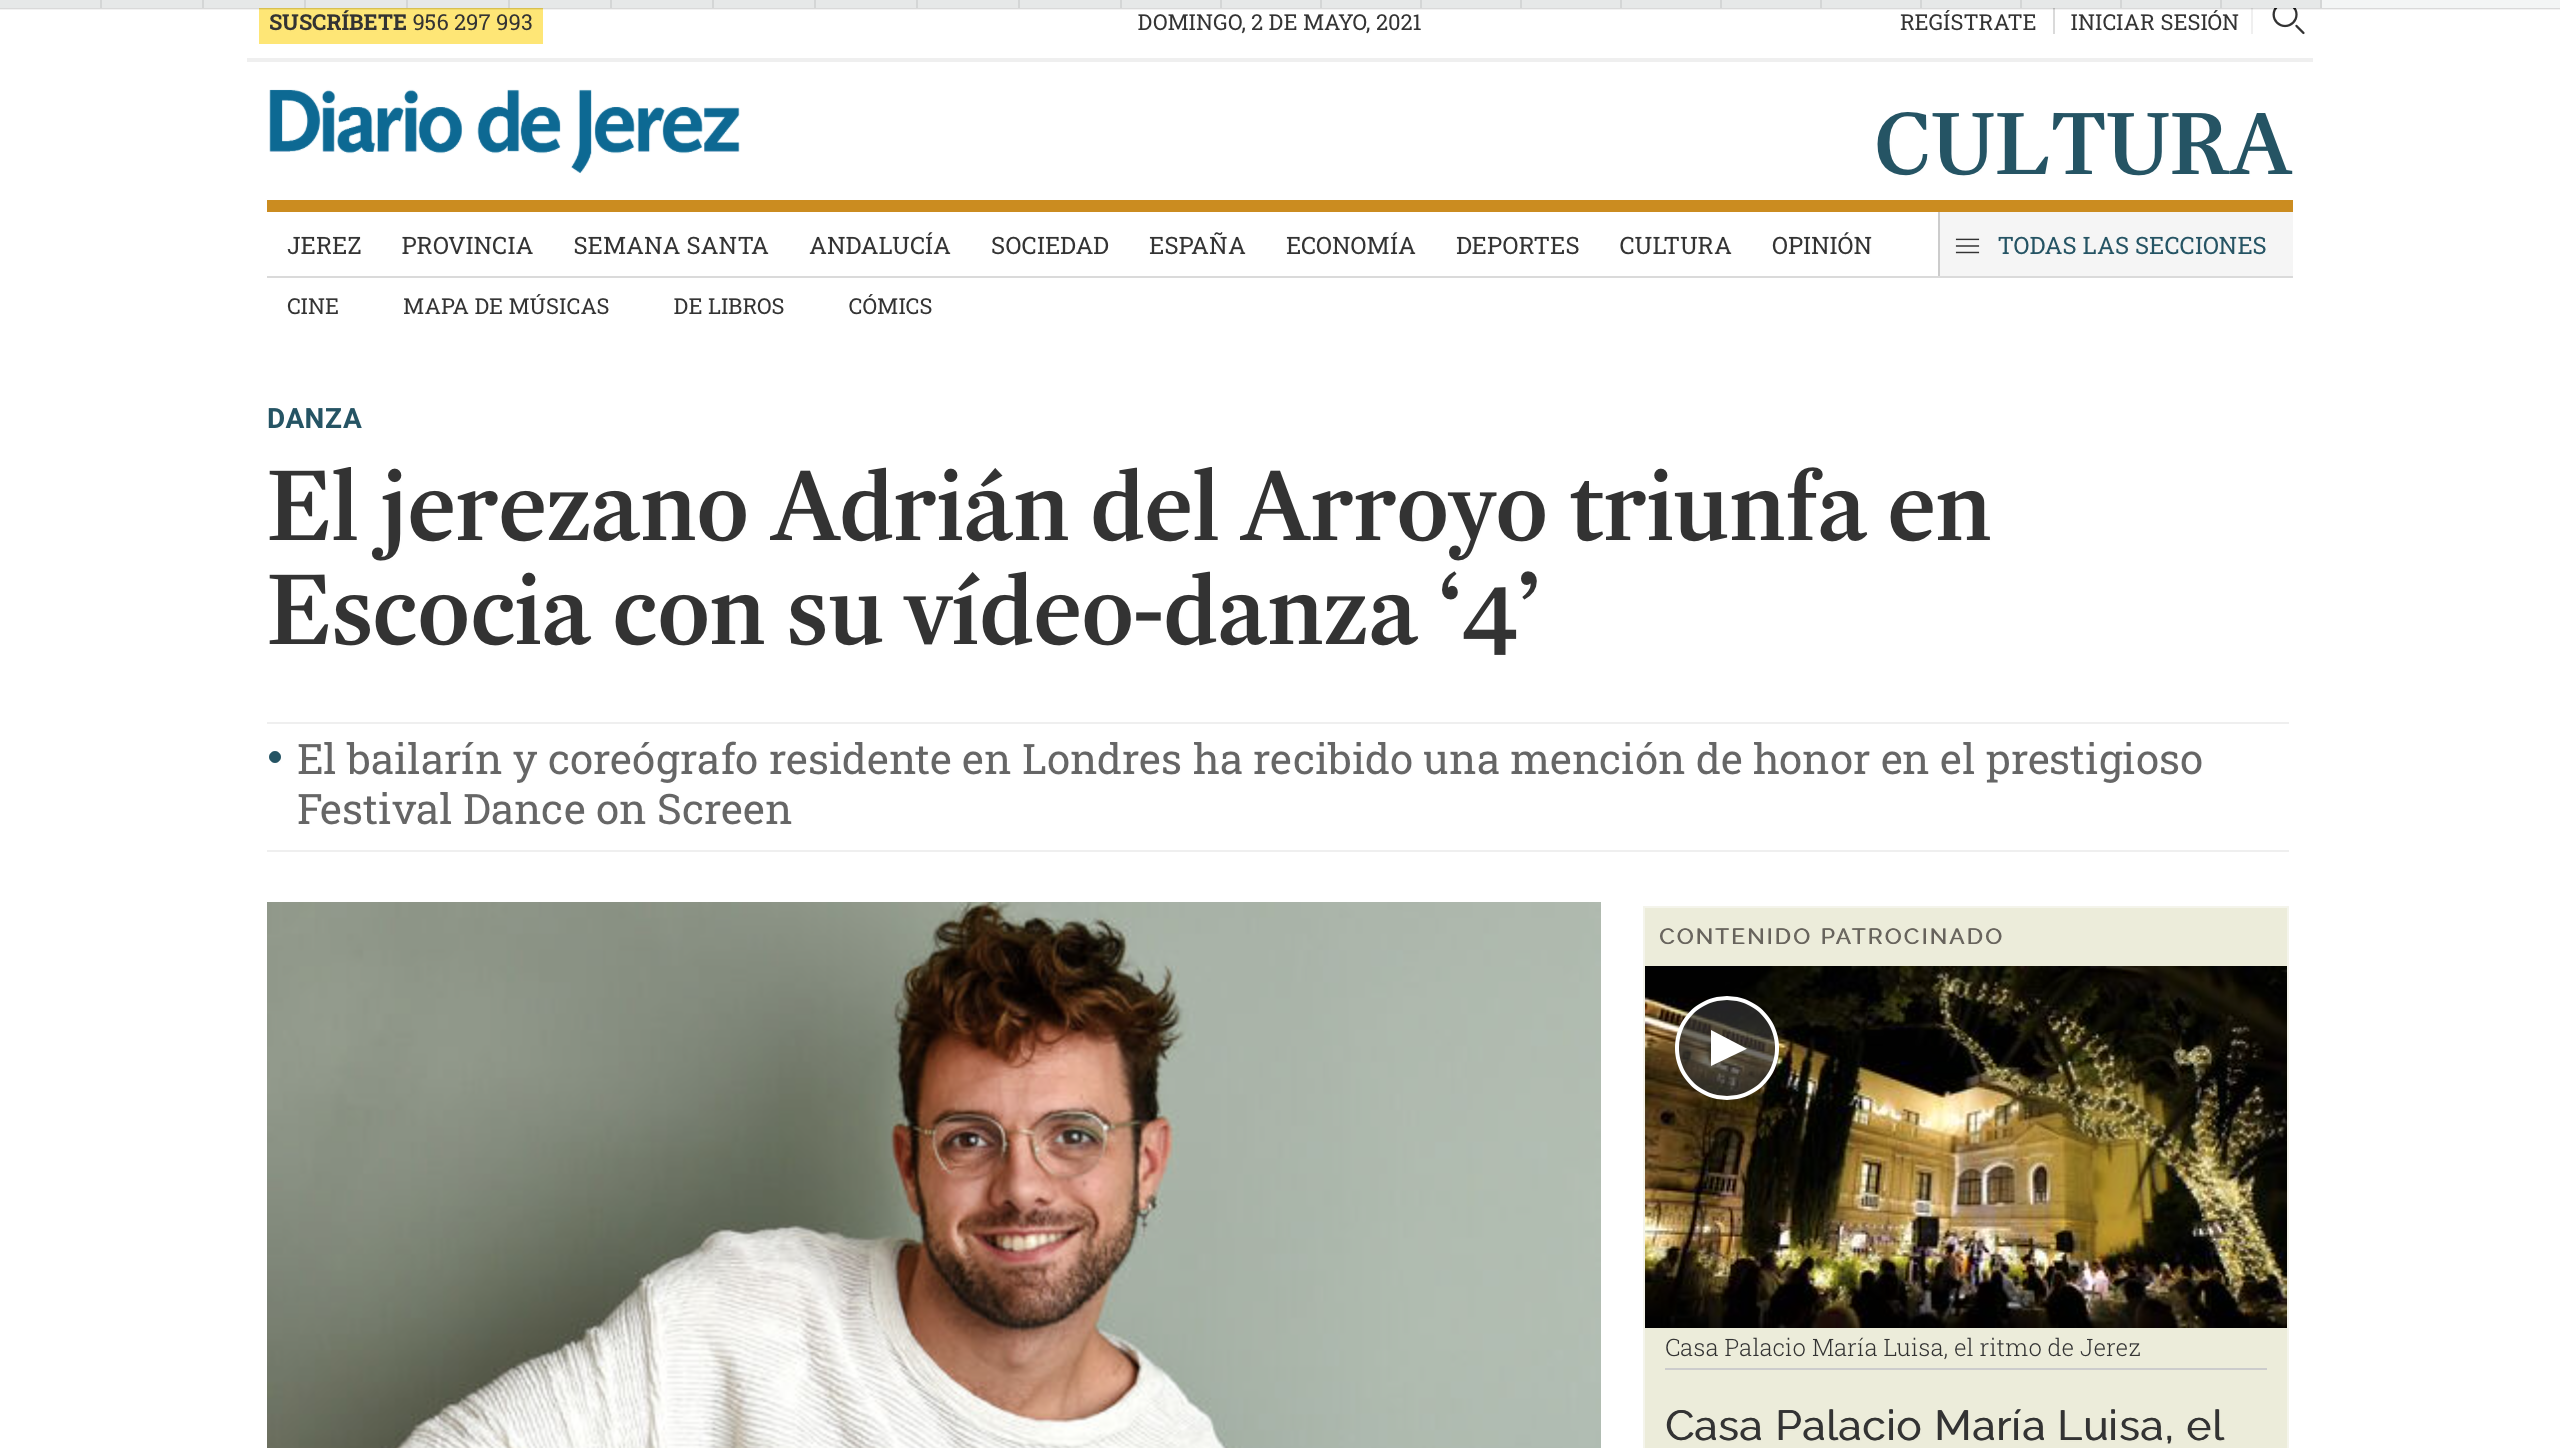 Diario de Jerez 1 Screenshot 2021-05-02 at 20.12.33